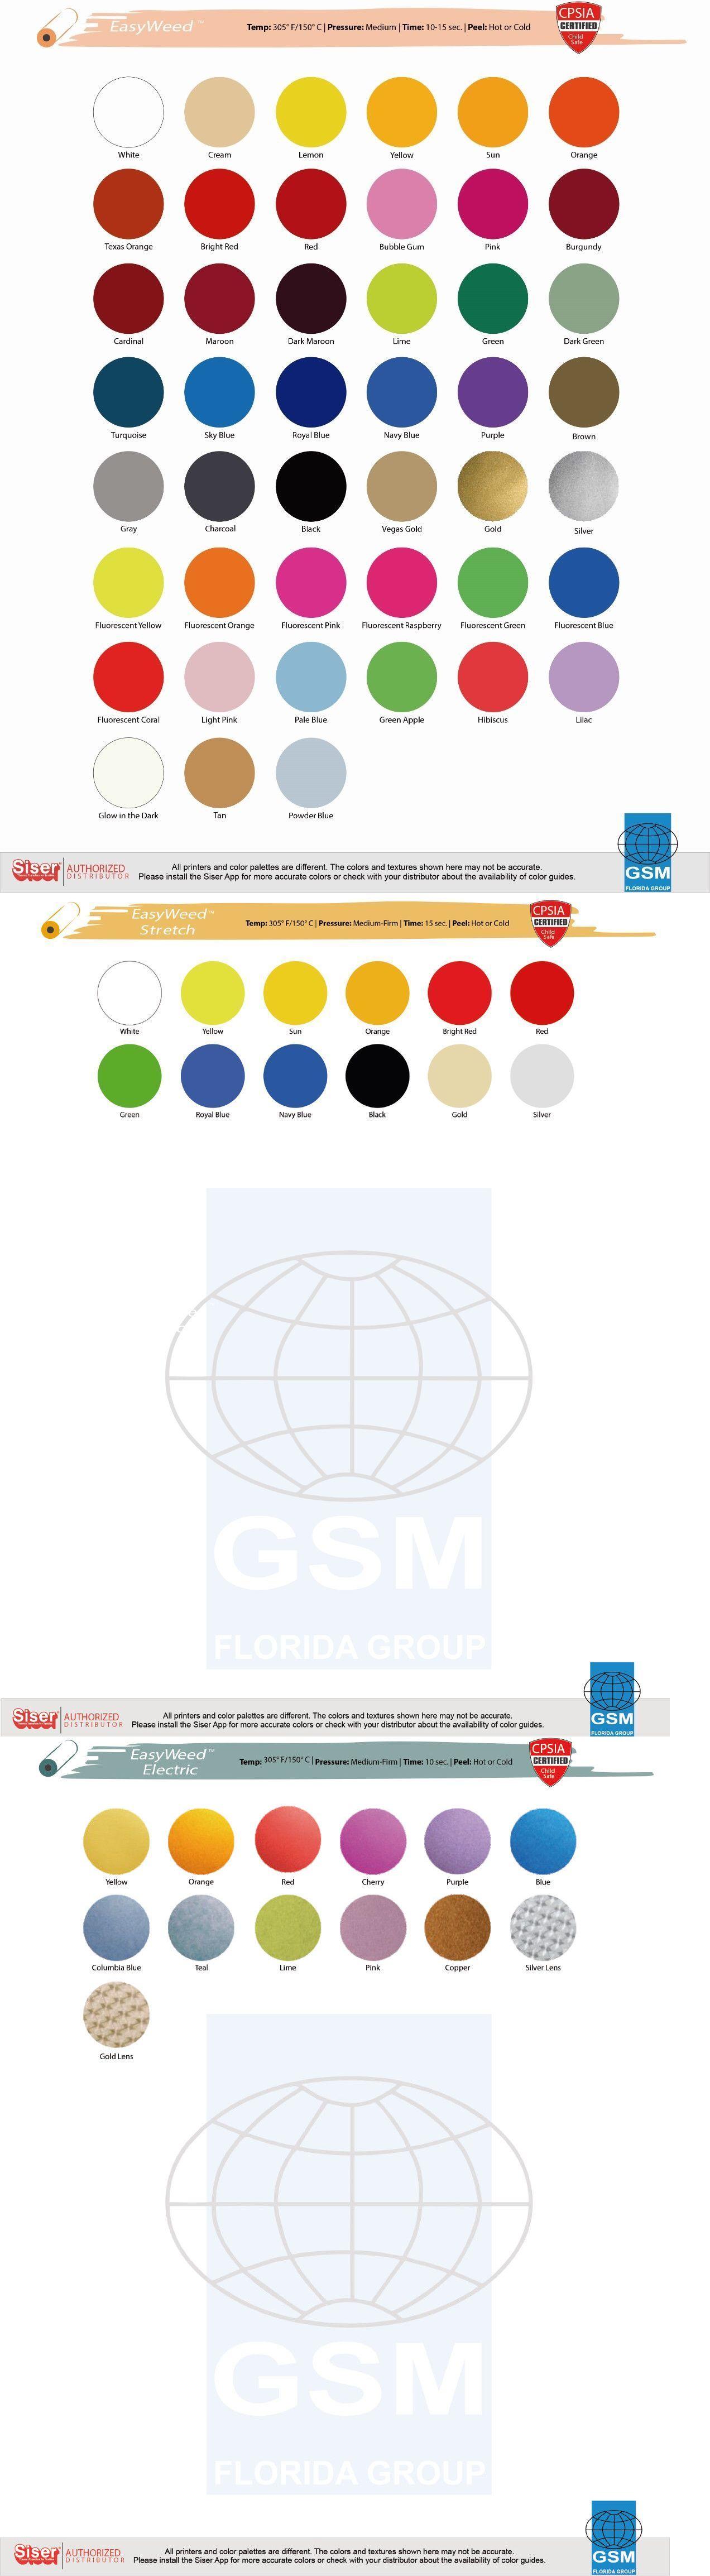 Siser Easyweed Htv Heat Transfer Vinyl 15 X 1 5 Yds For T Shirts Textile Heat Transfer Vinyl Siser Siser Easyweed